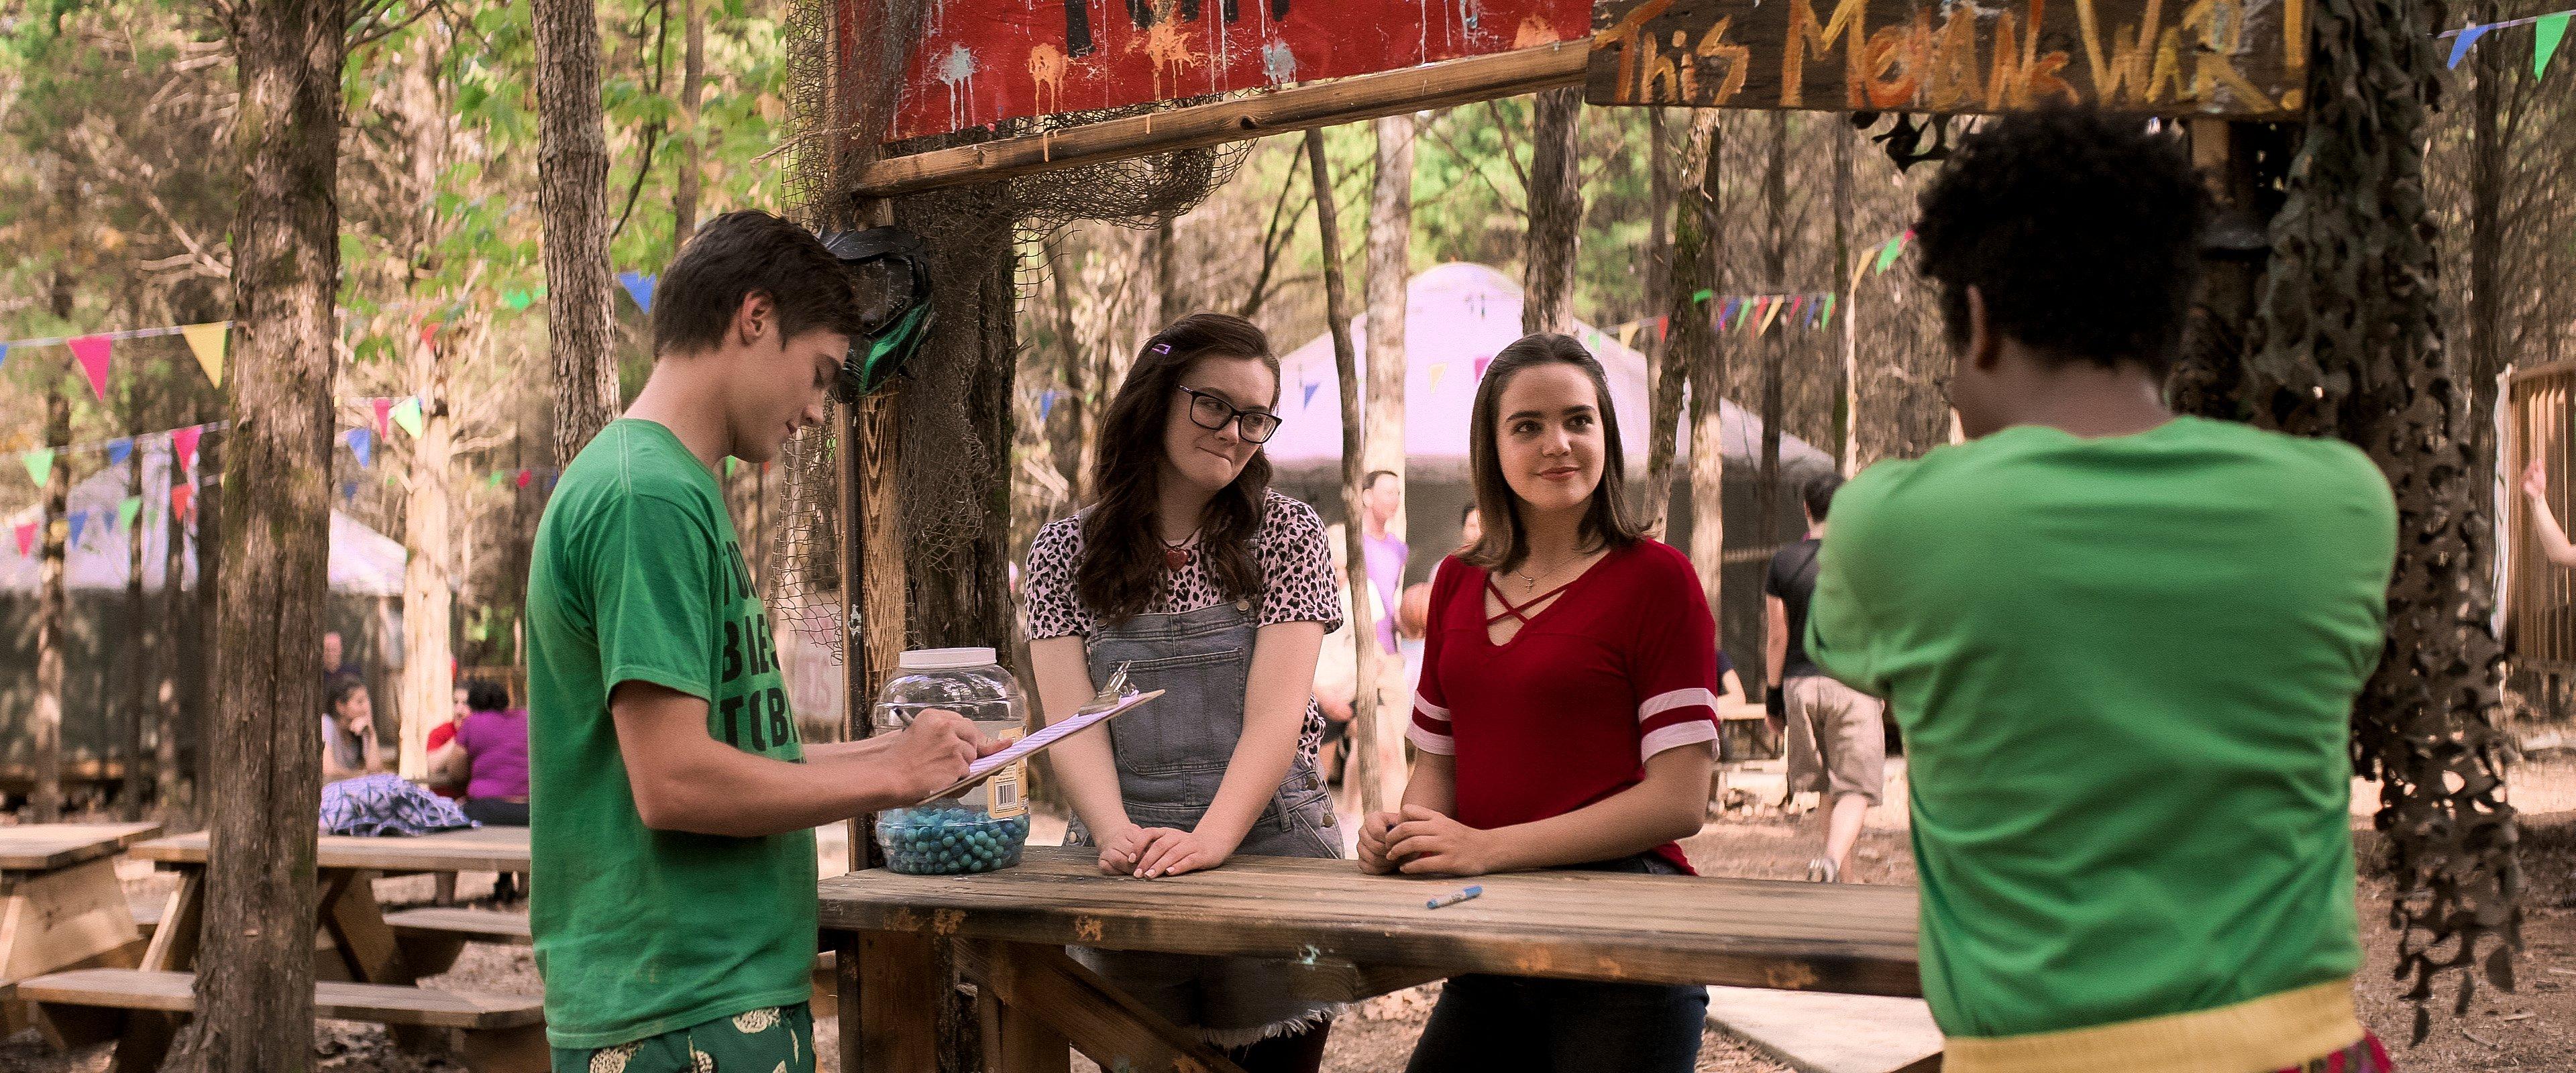 teenagers at craft station at camp